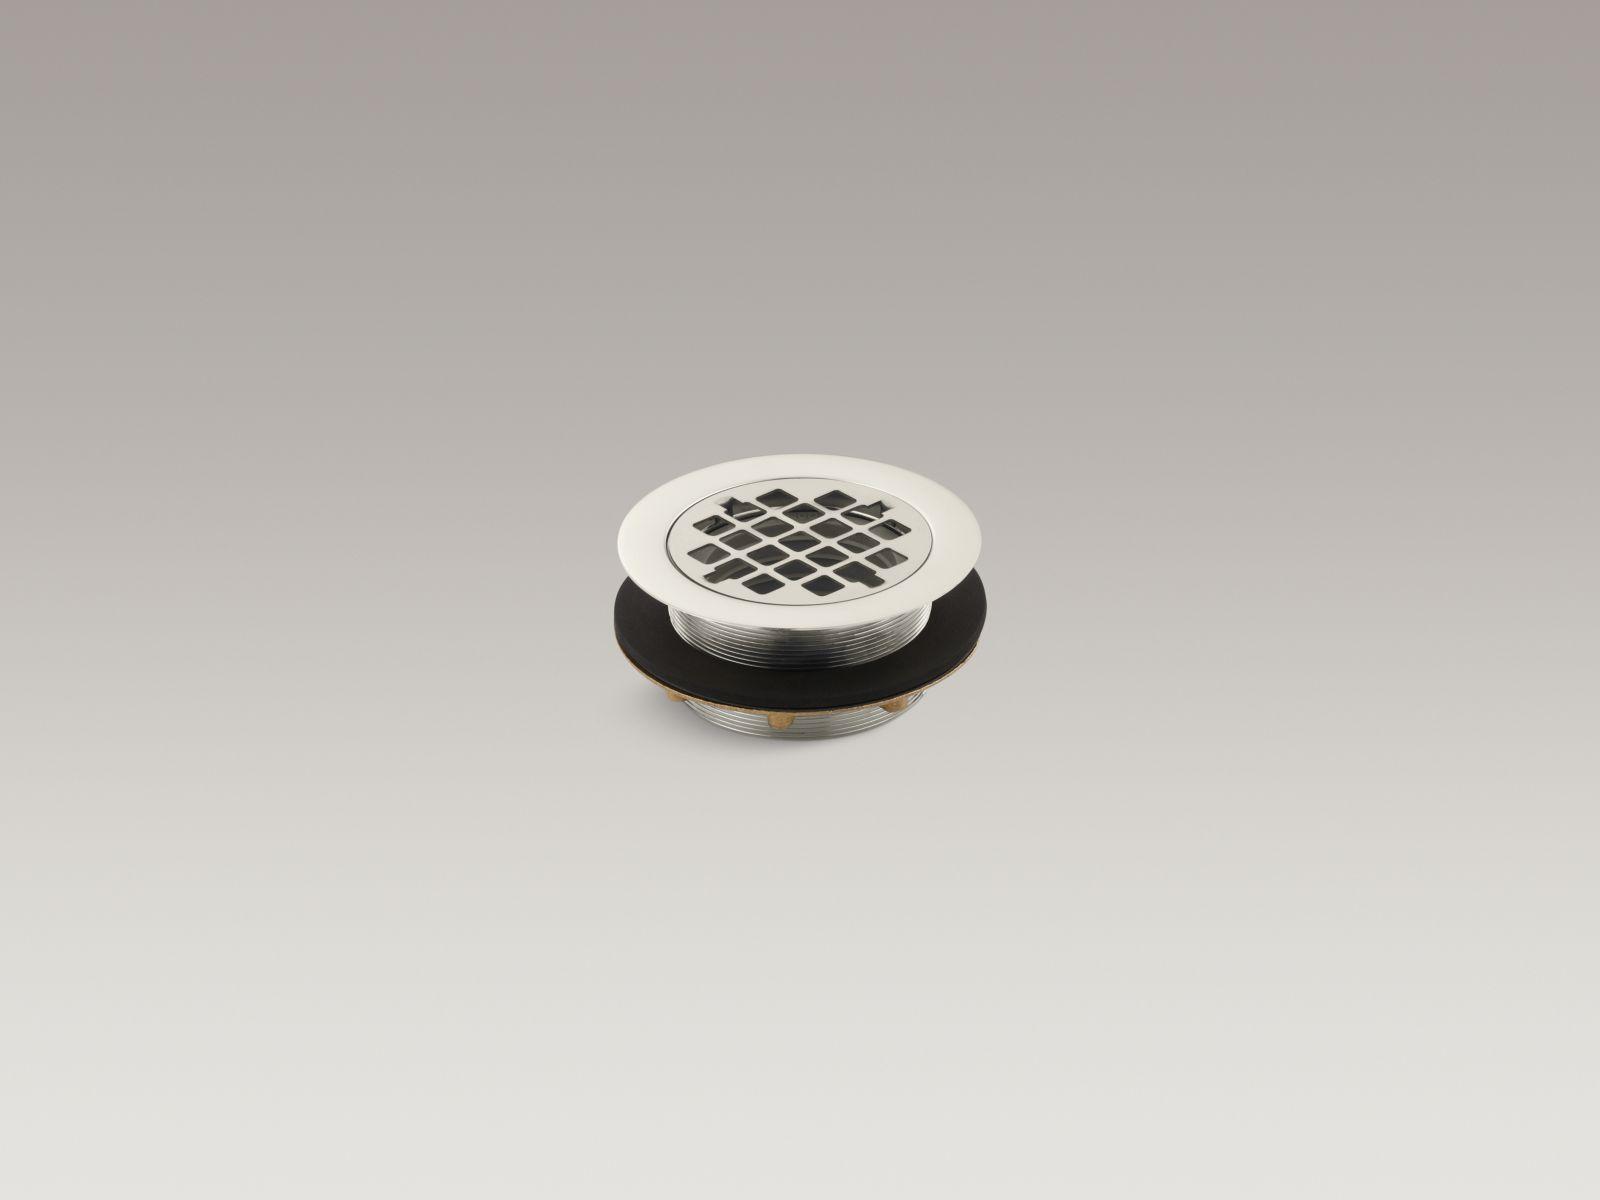 Kohler K-9132-SN Round Shower Base Drain with Plastic Pipe Gasket Vibrant Polished Nickel